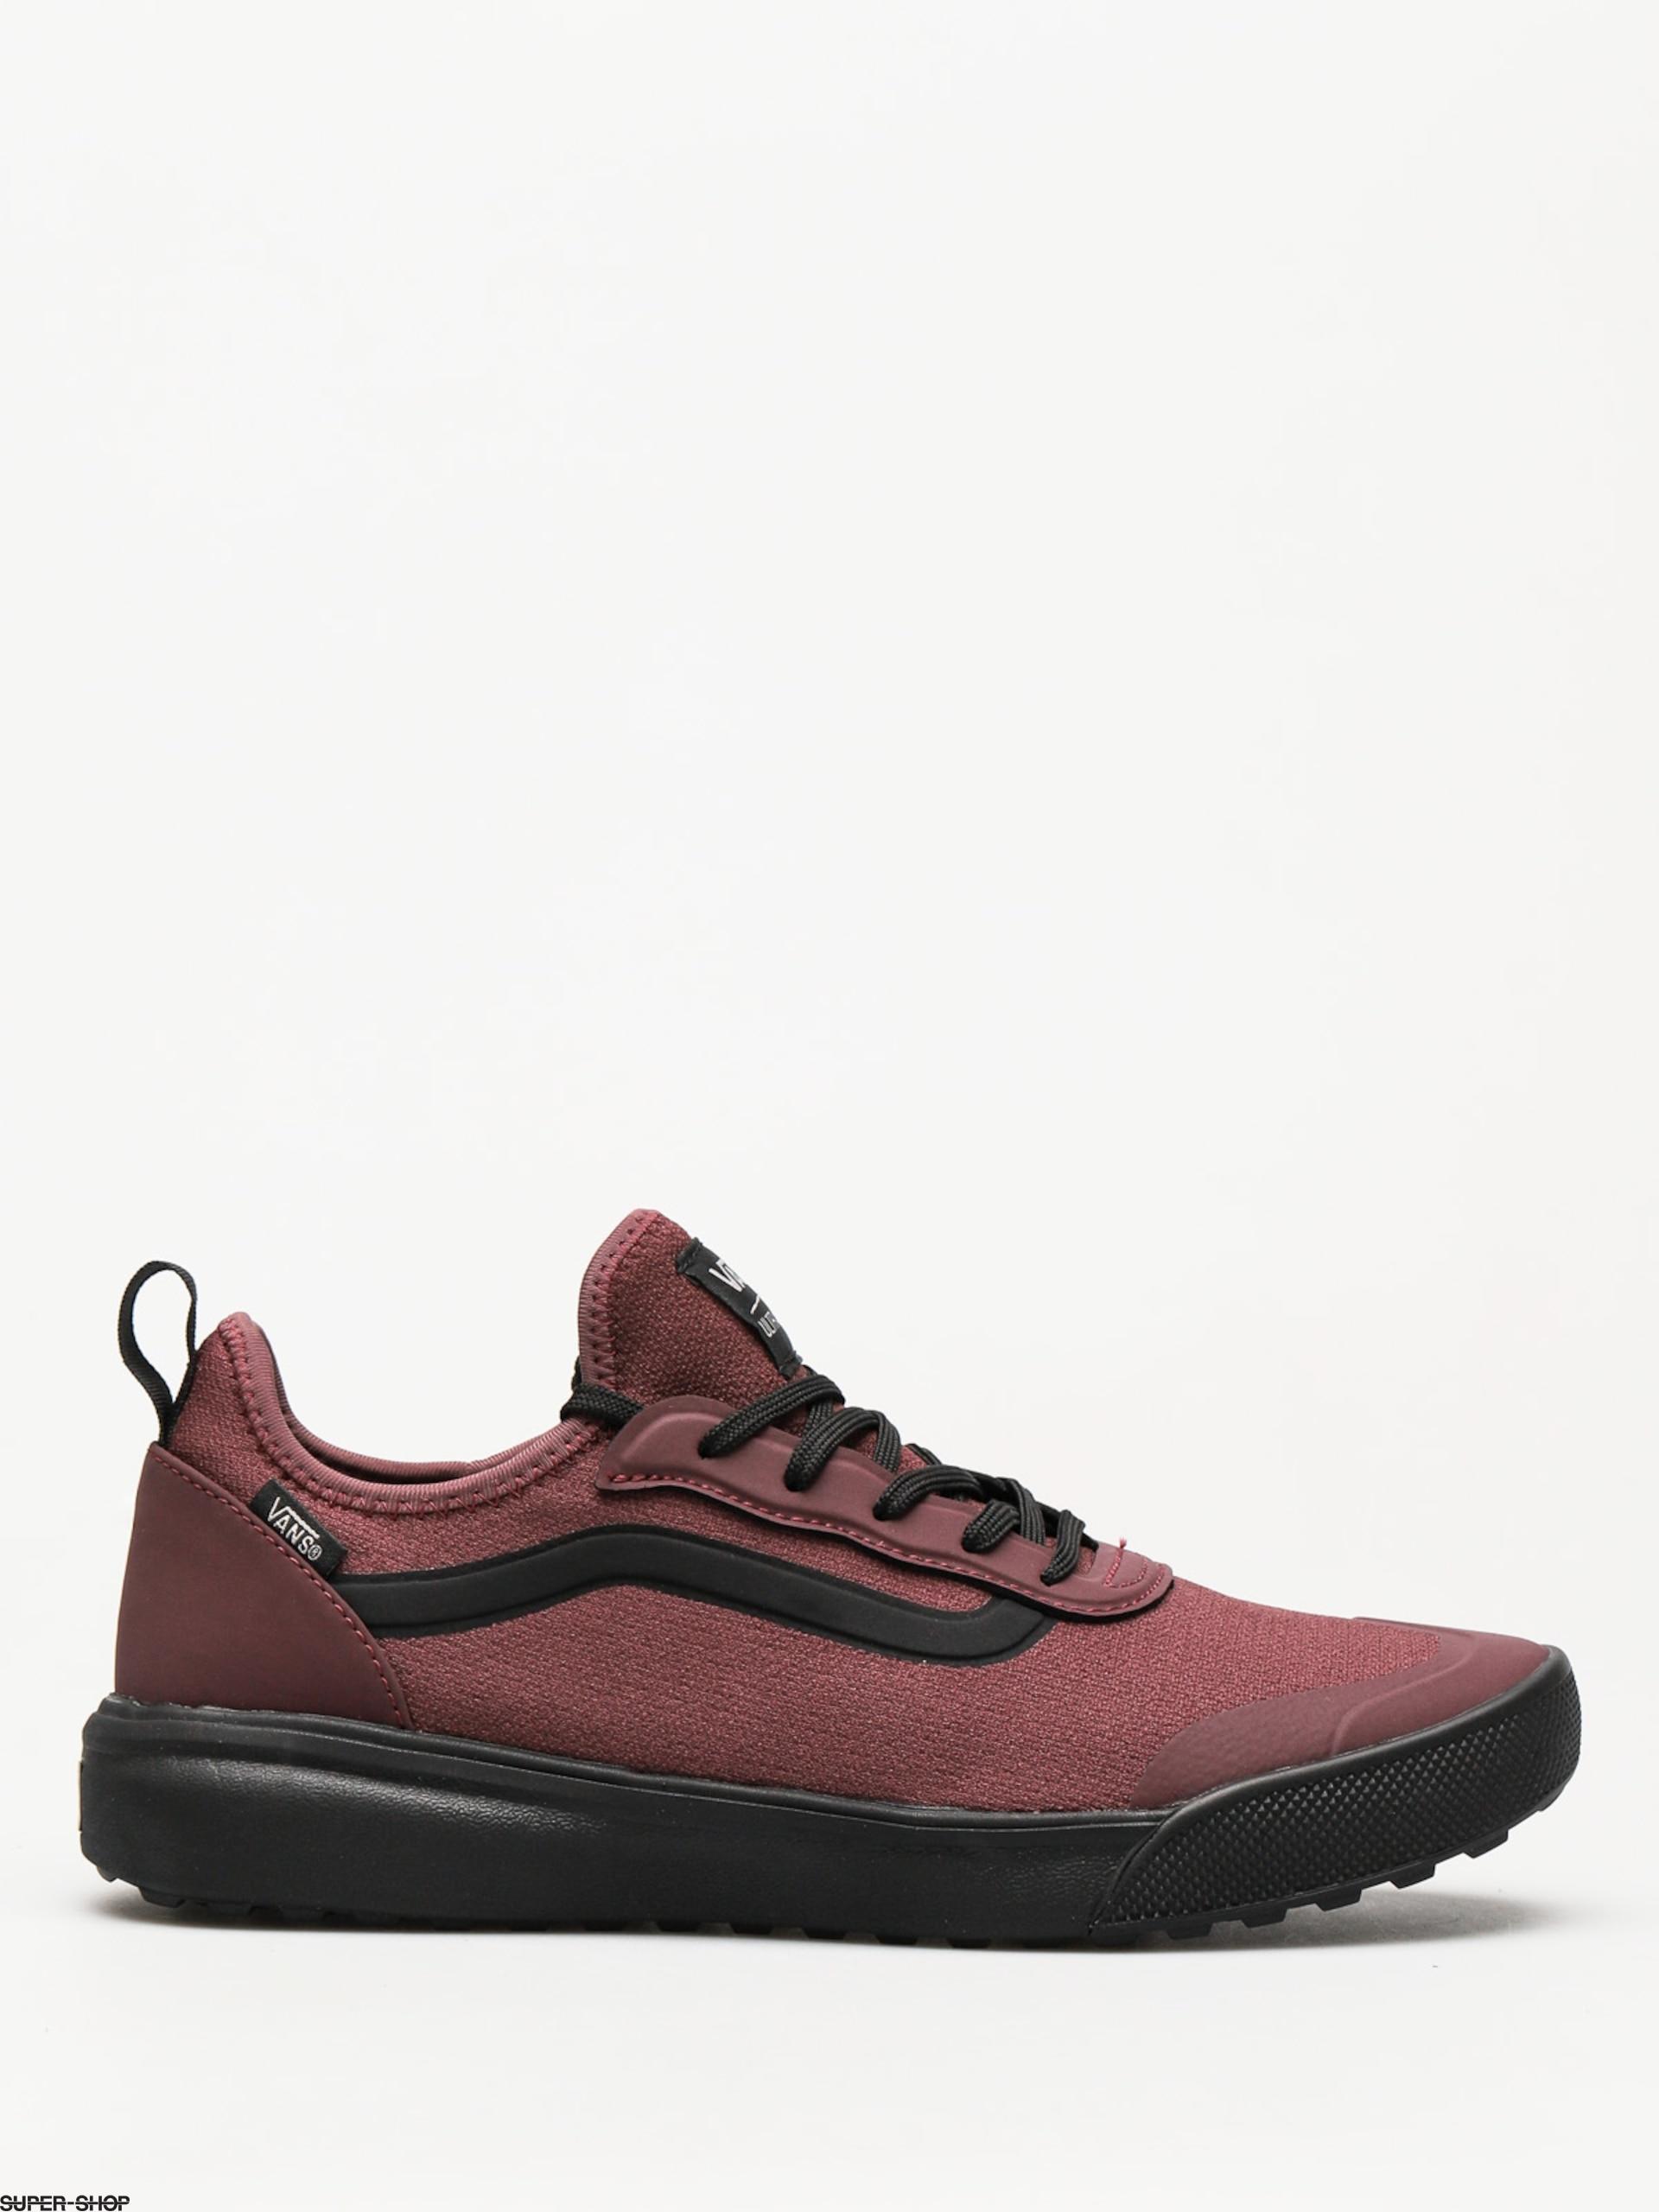 372cd8ce76c 948913-w1920-vans-shoes-ultrarange-ac-catawba-grape-black.jpg